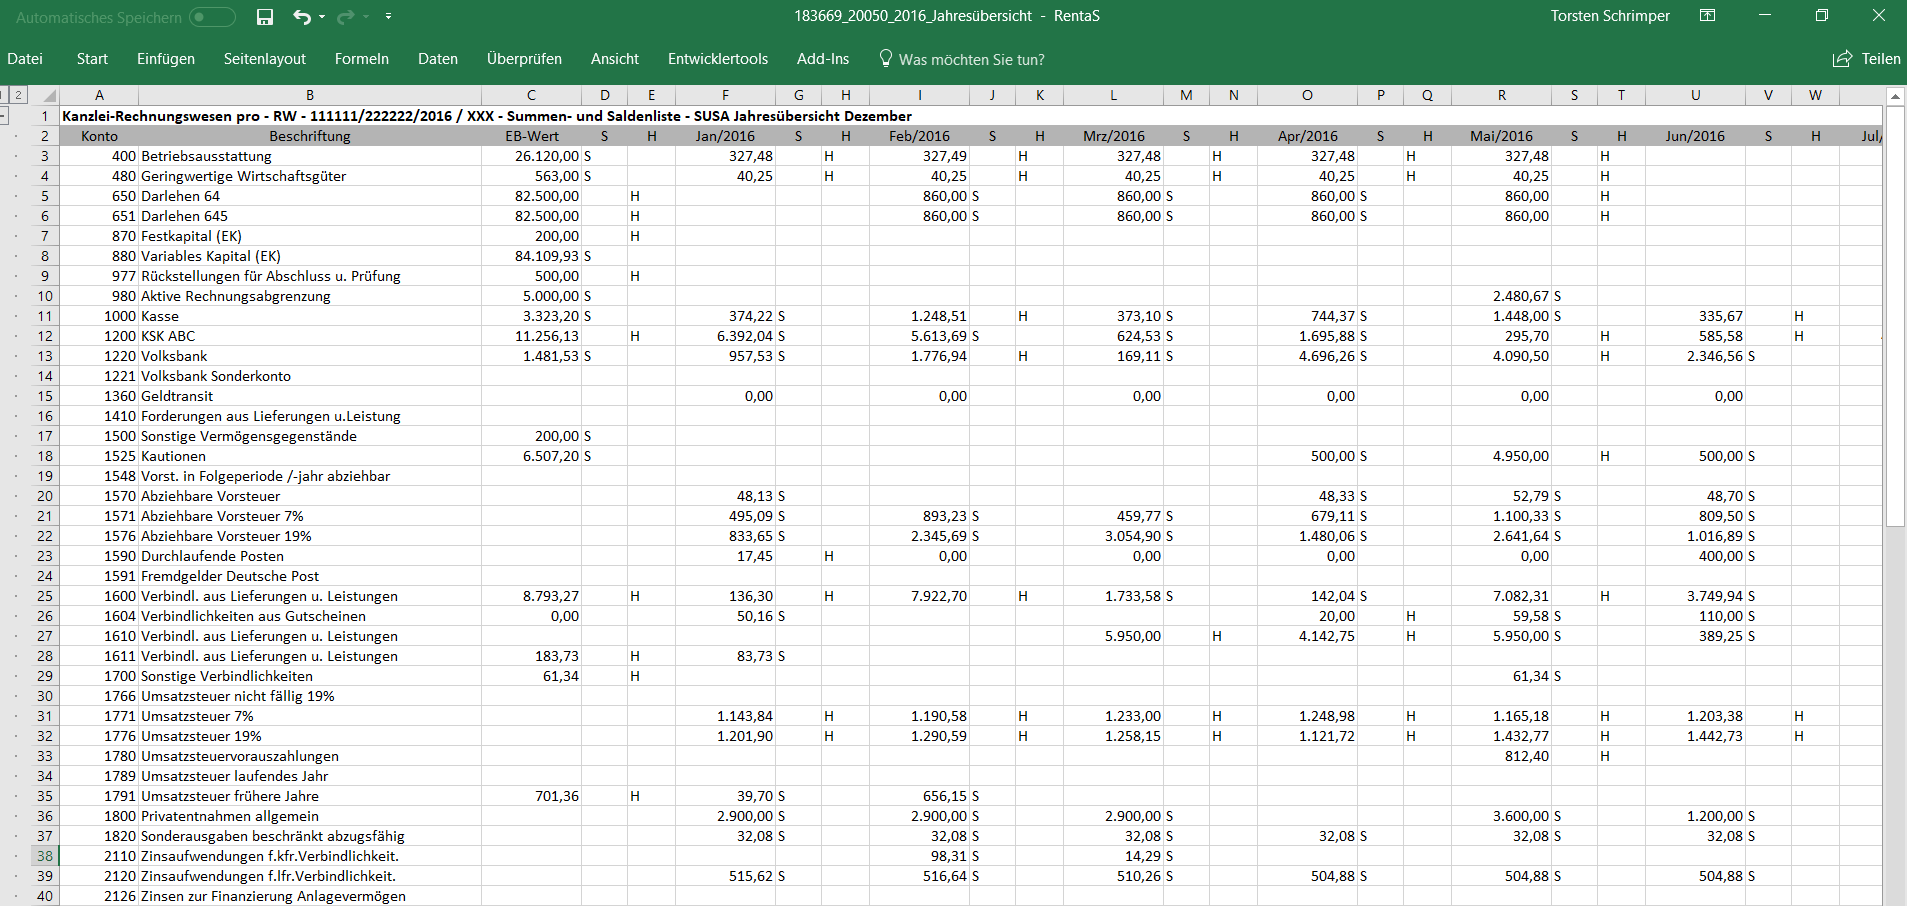 Datev_Saldenliste_Excel_Export_Rentas_Excel-Tabelle